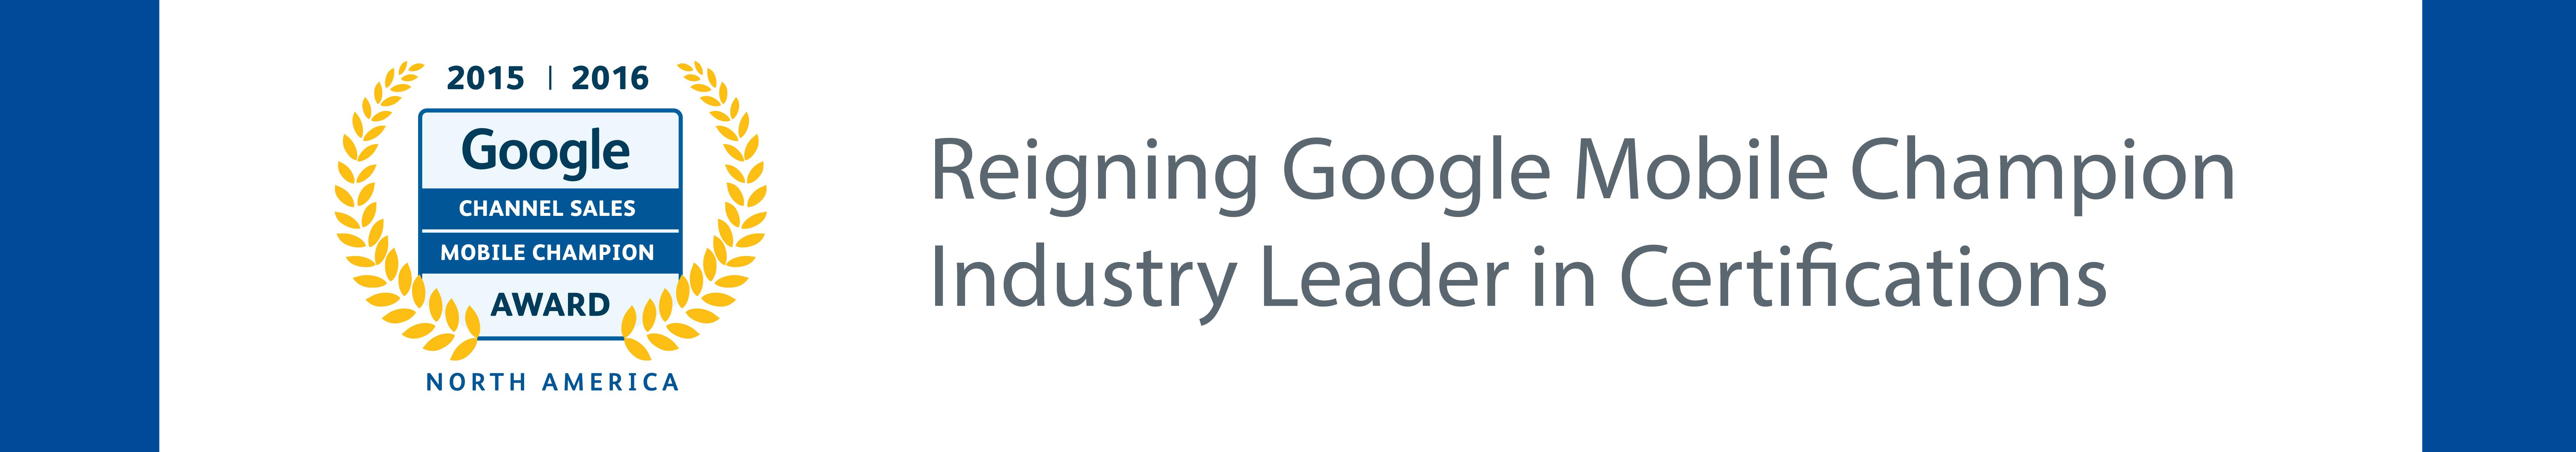 google mobile champion image